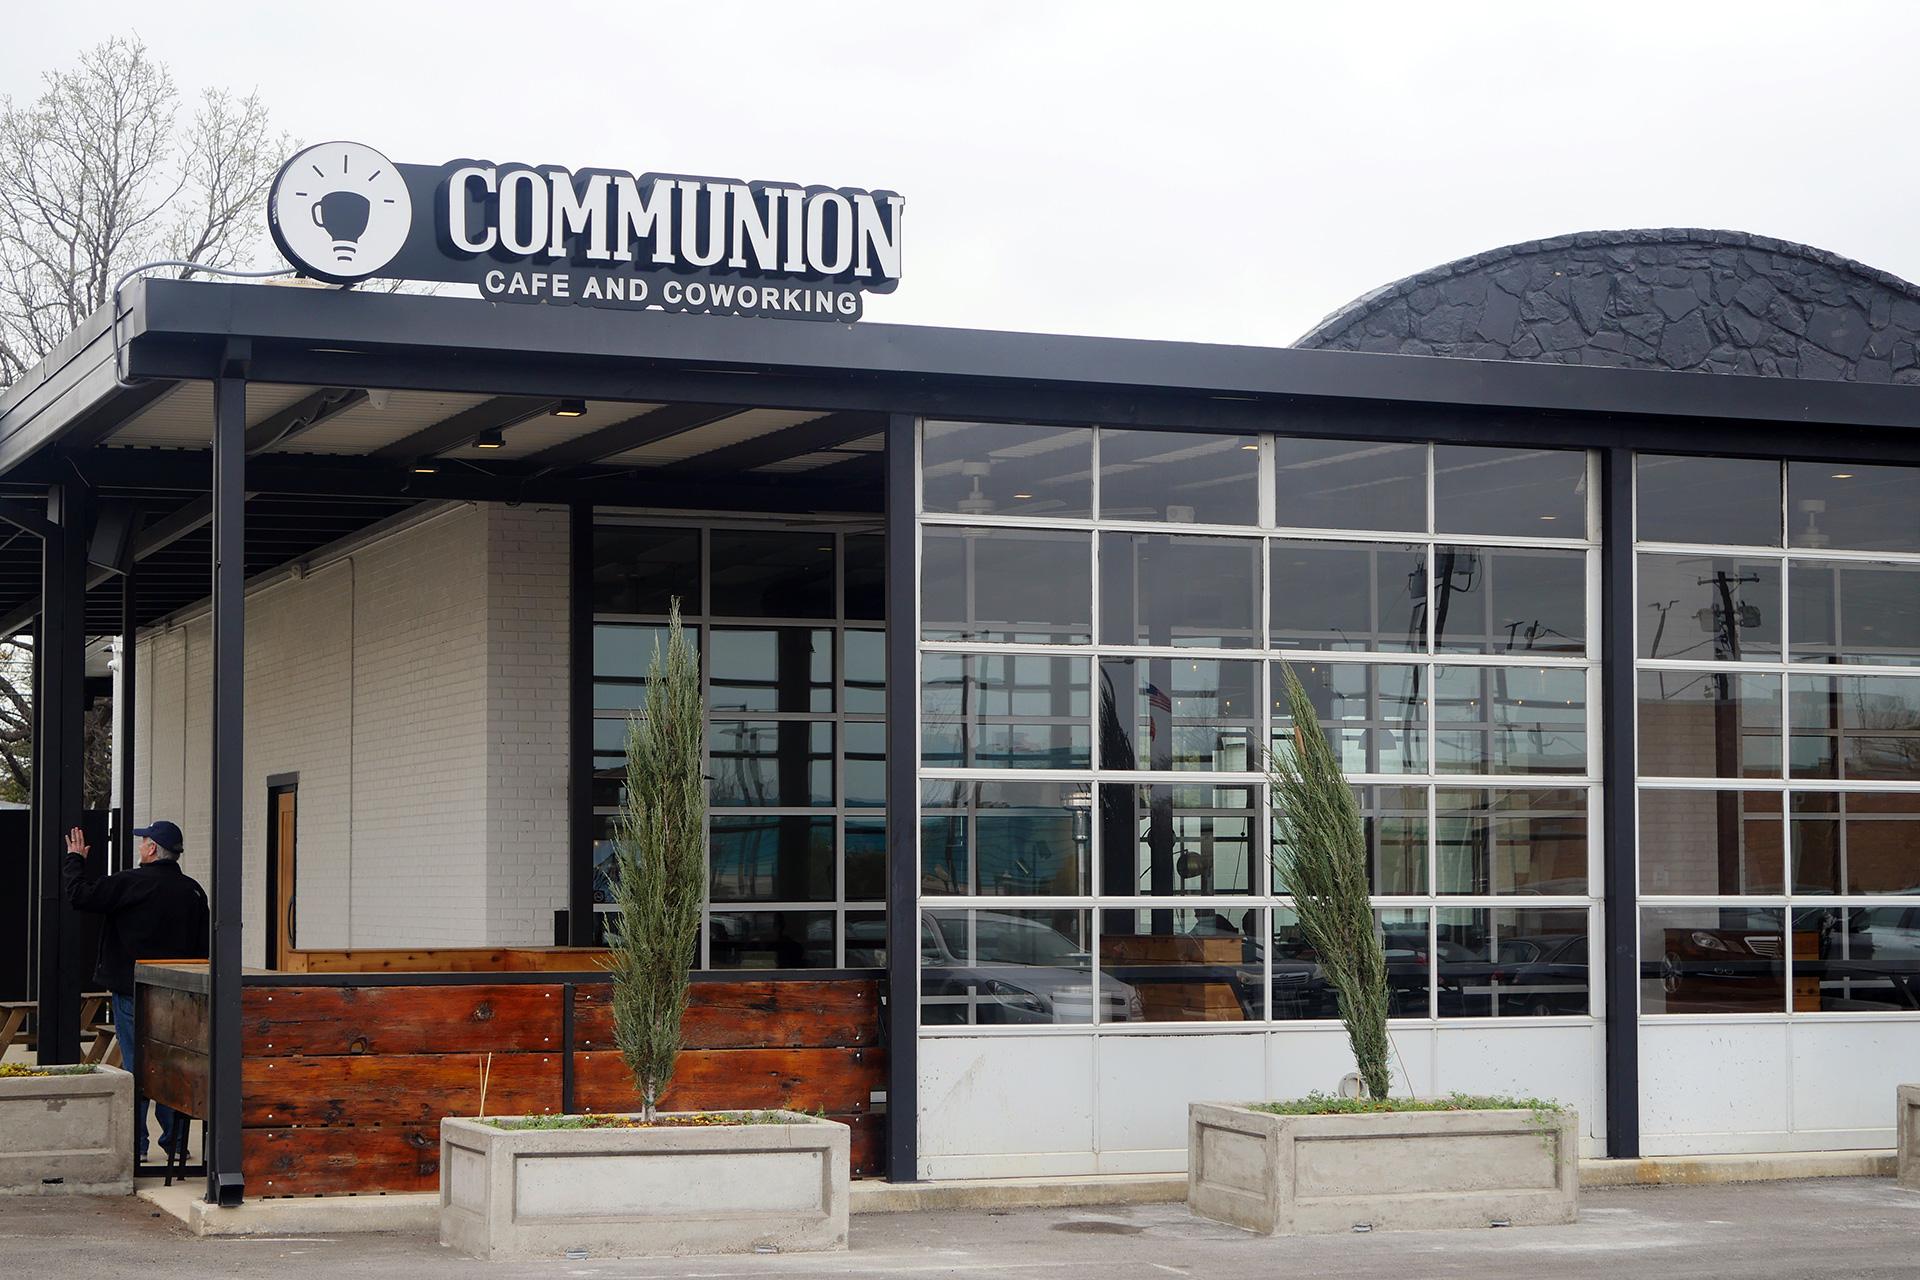 Communion Neighborhood Cooperative